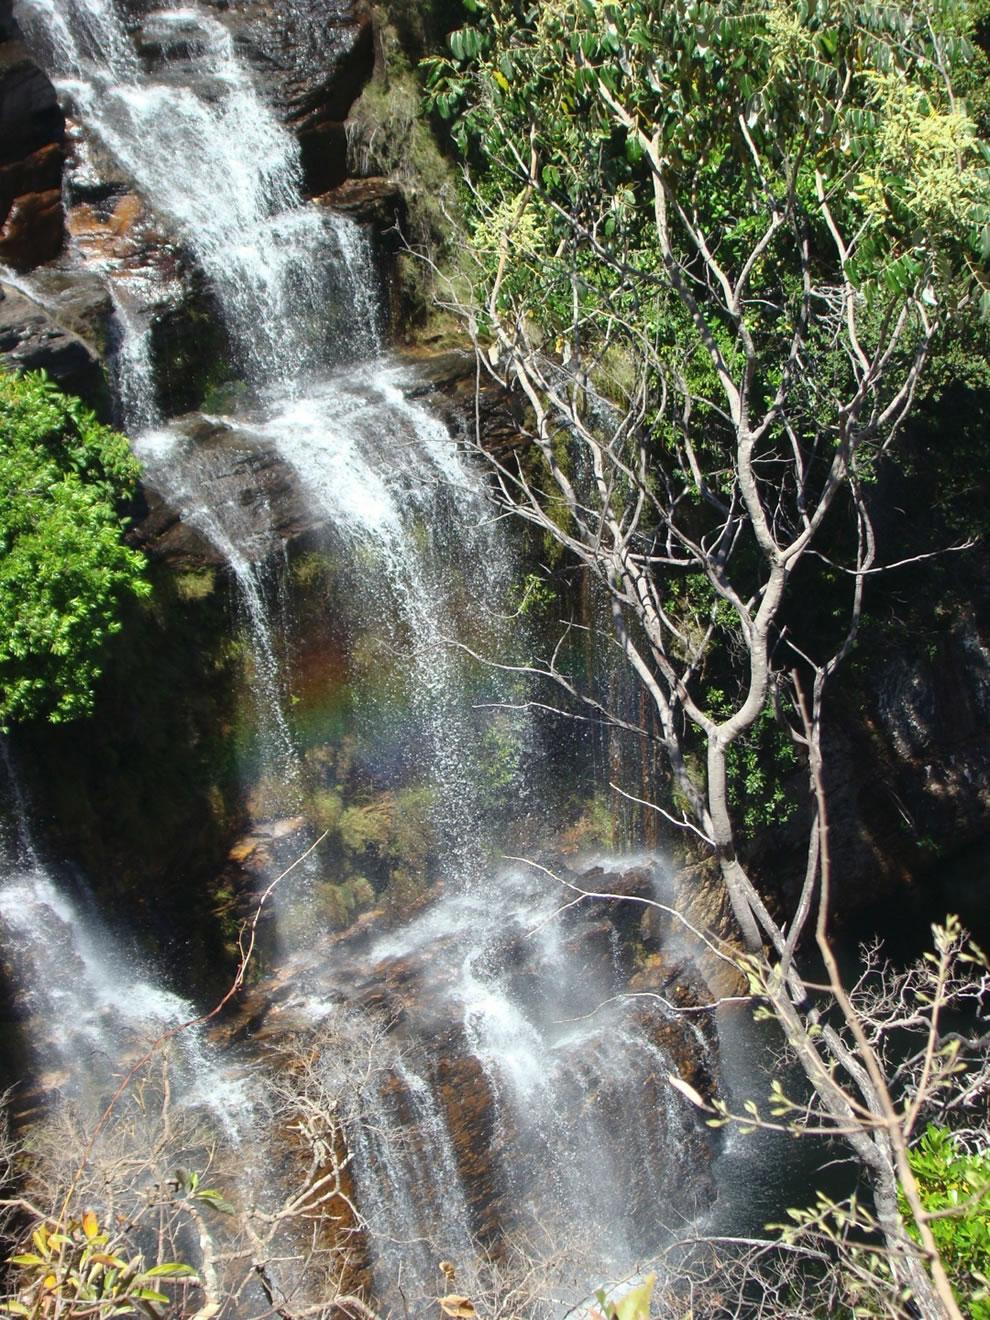 rainbow and waterfall at Chapada dos Veadeiros National Park